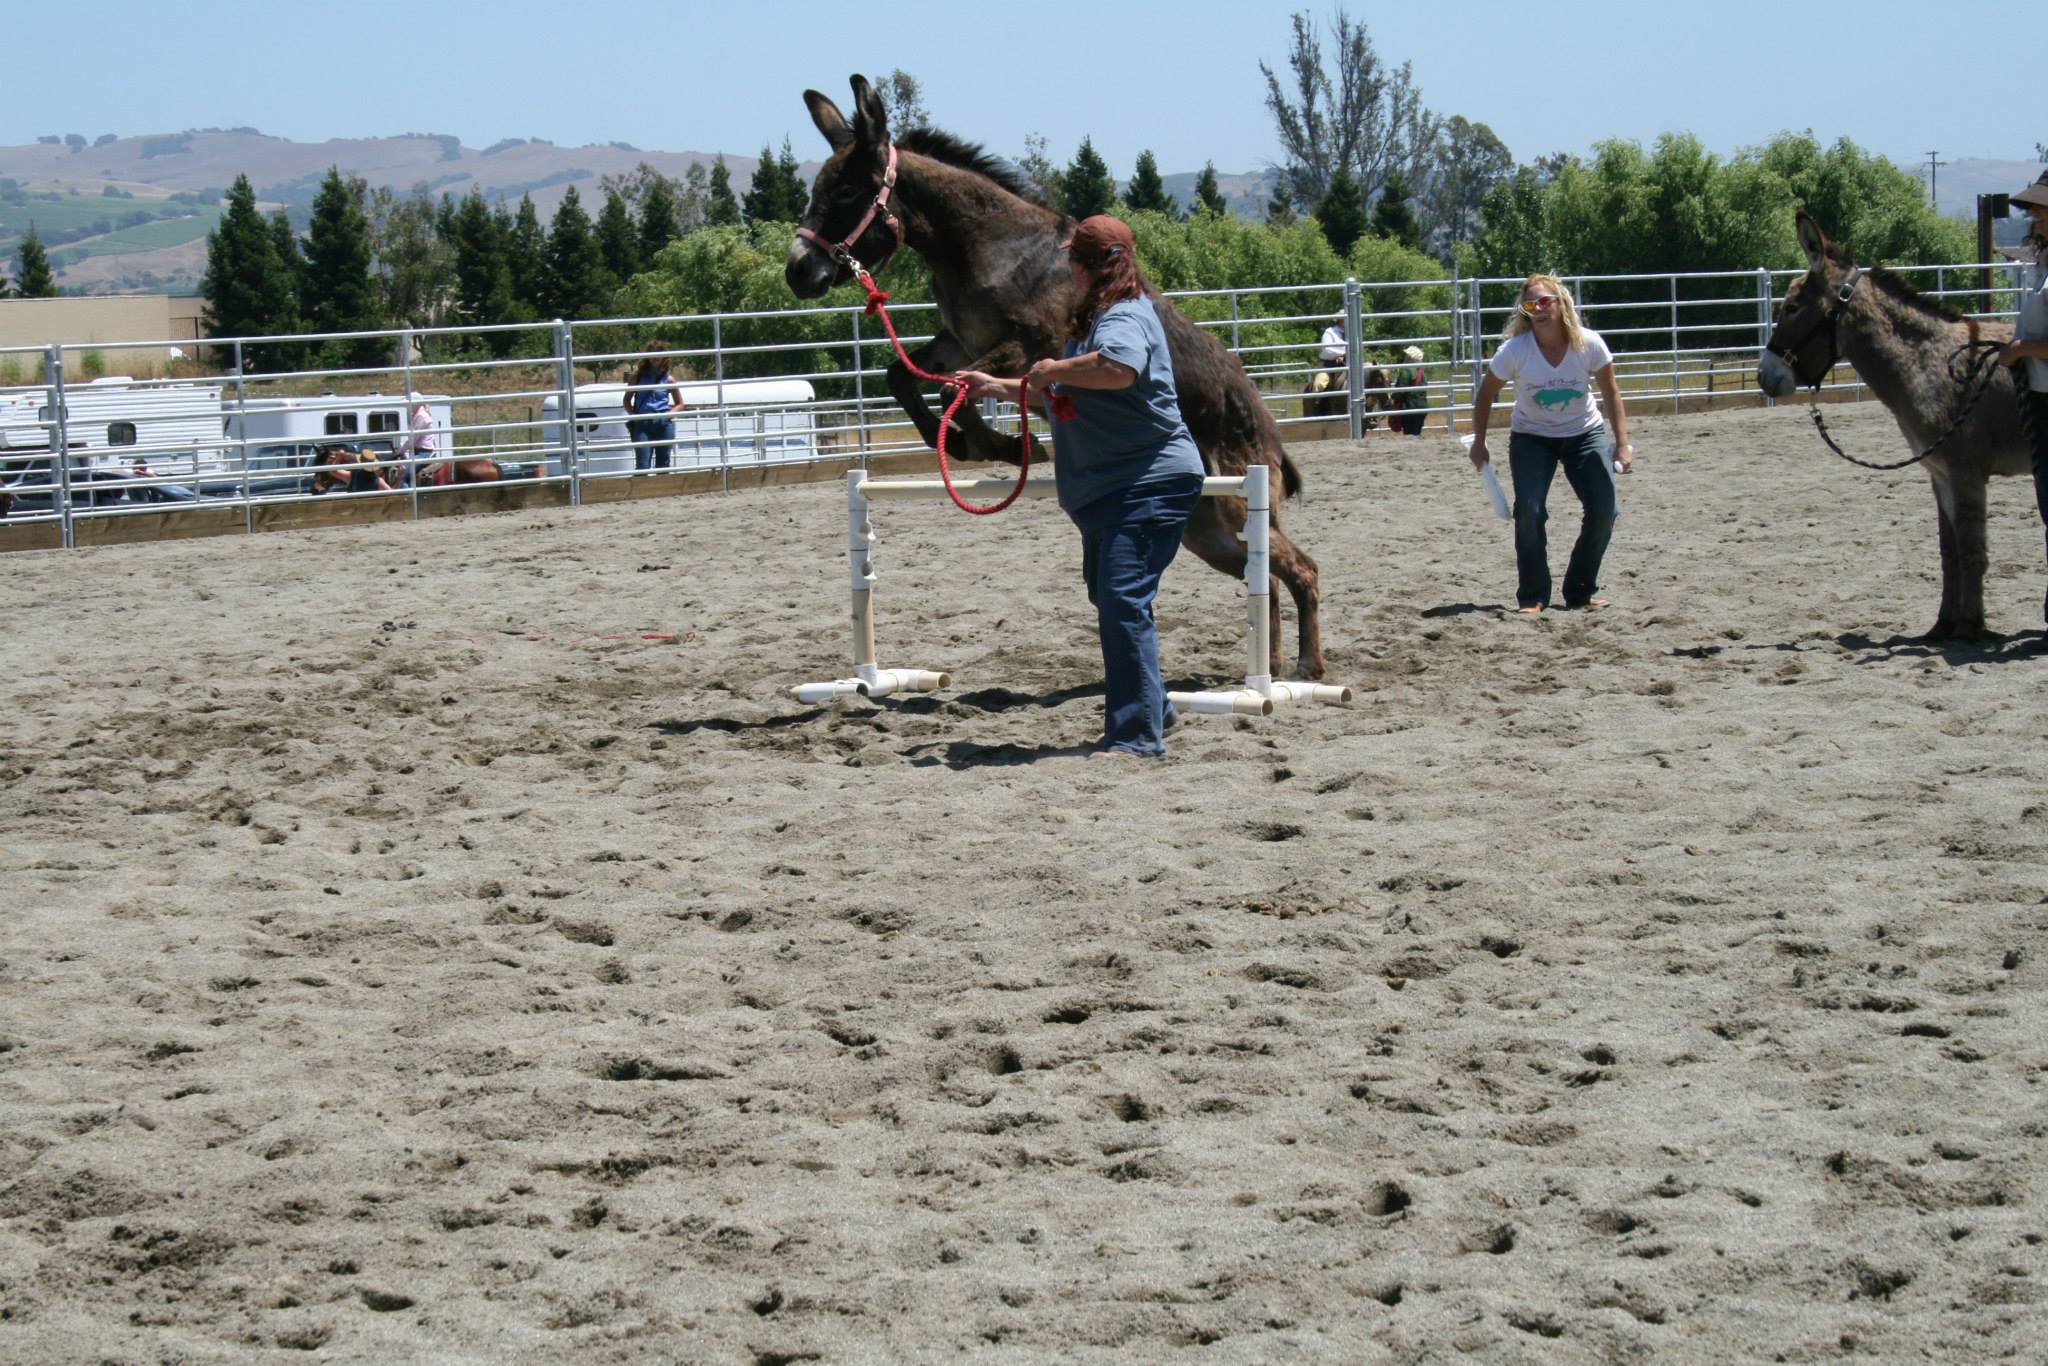 Burro Jumping